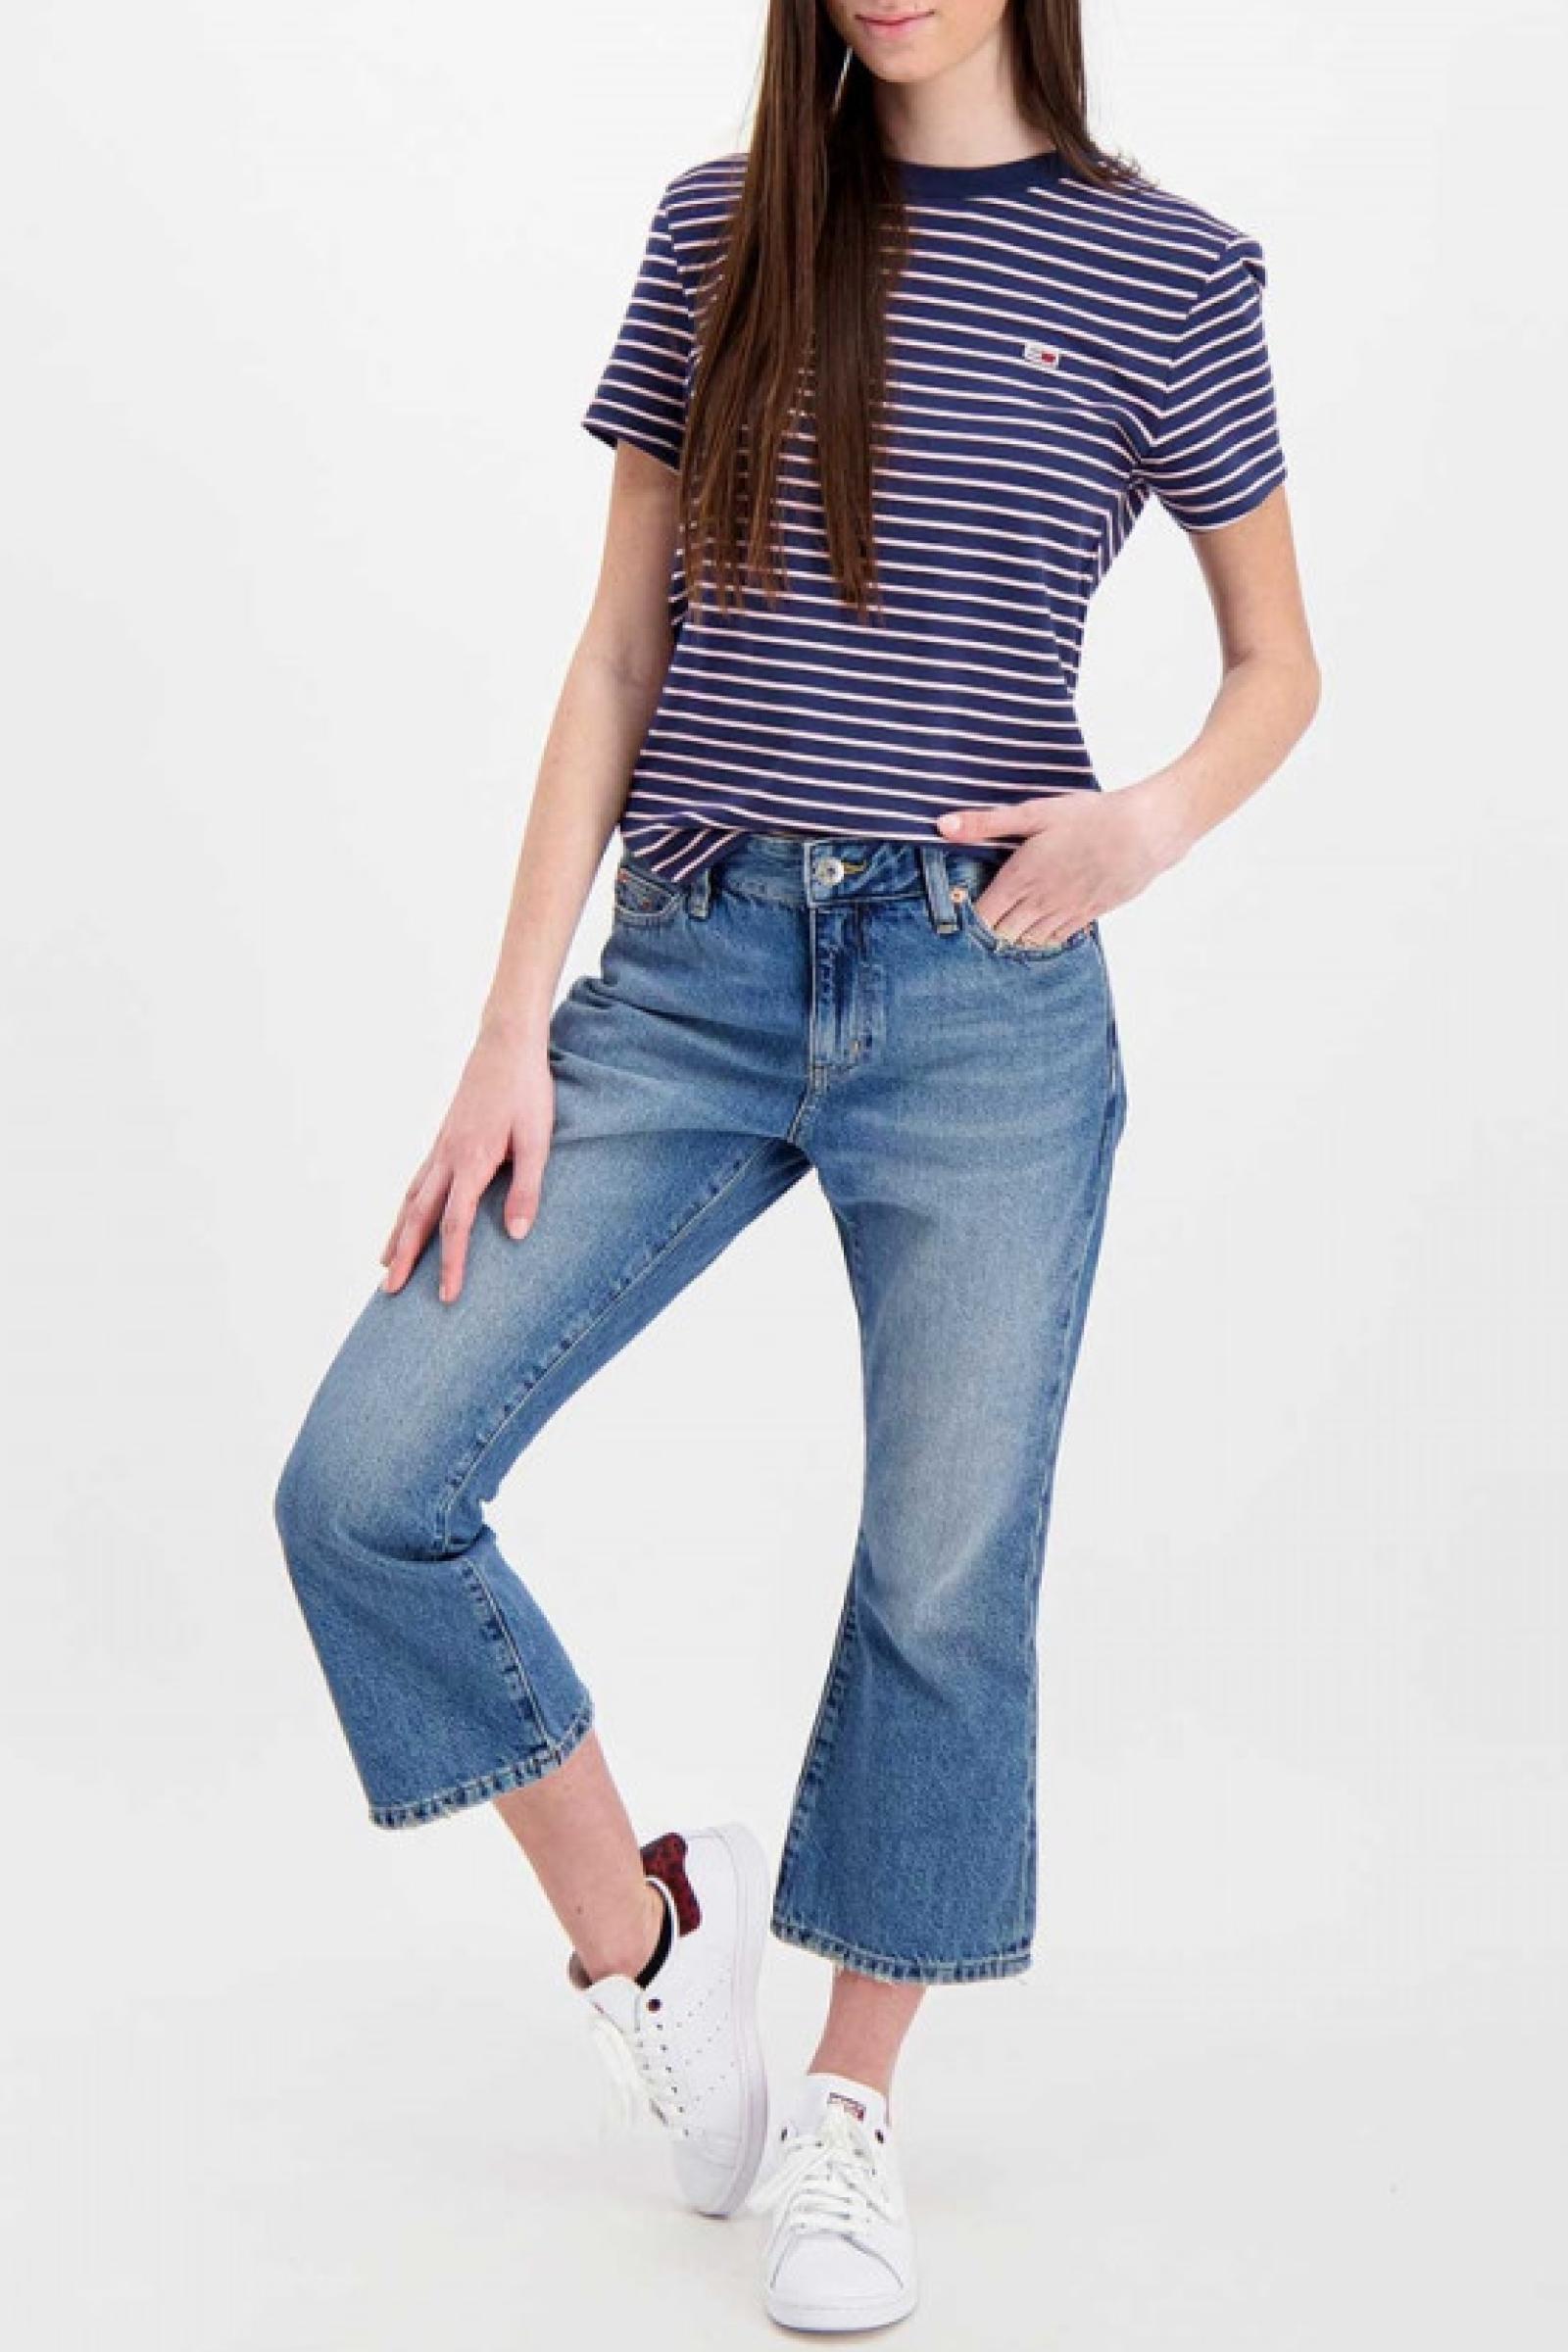 TOMMY JEANS Women's jeans TOMMY JEANS   Jeans   DW0DW077951A5